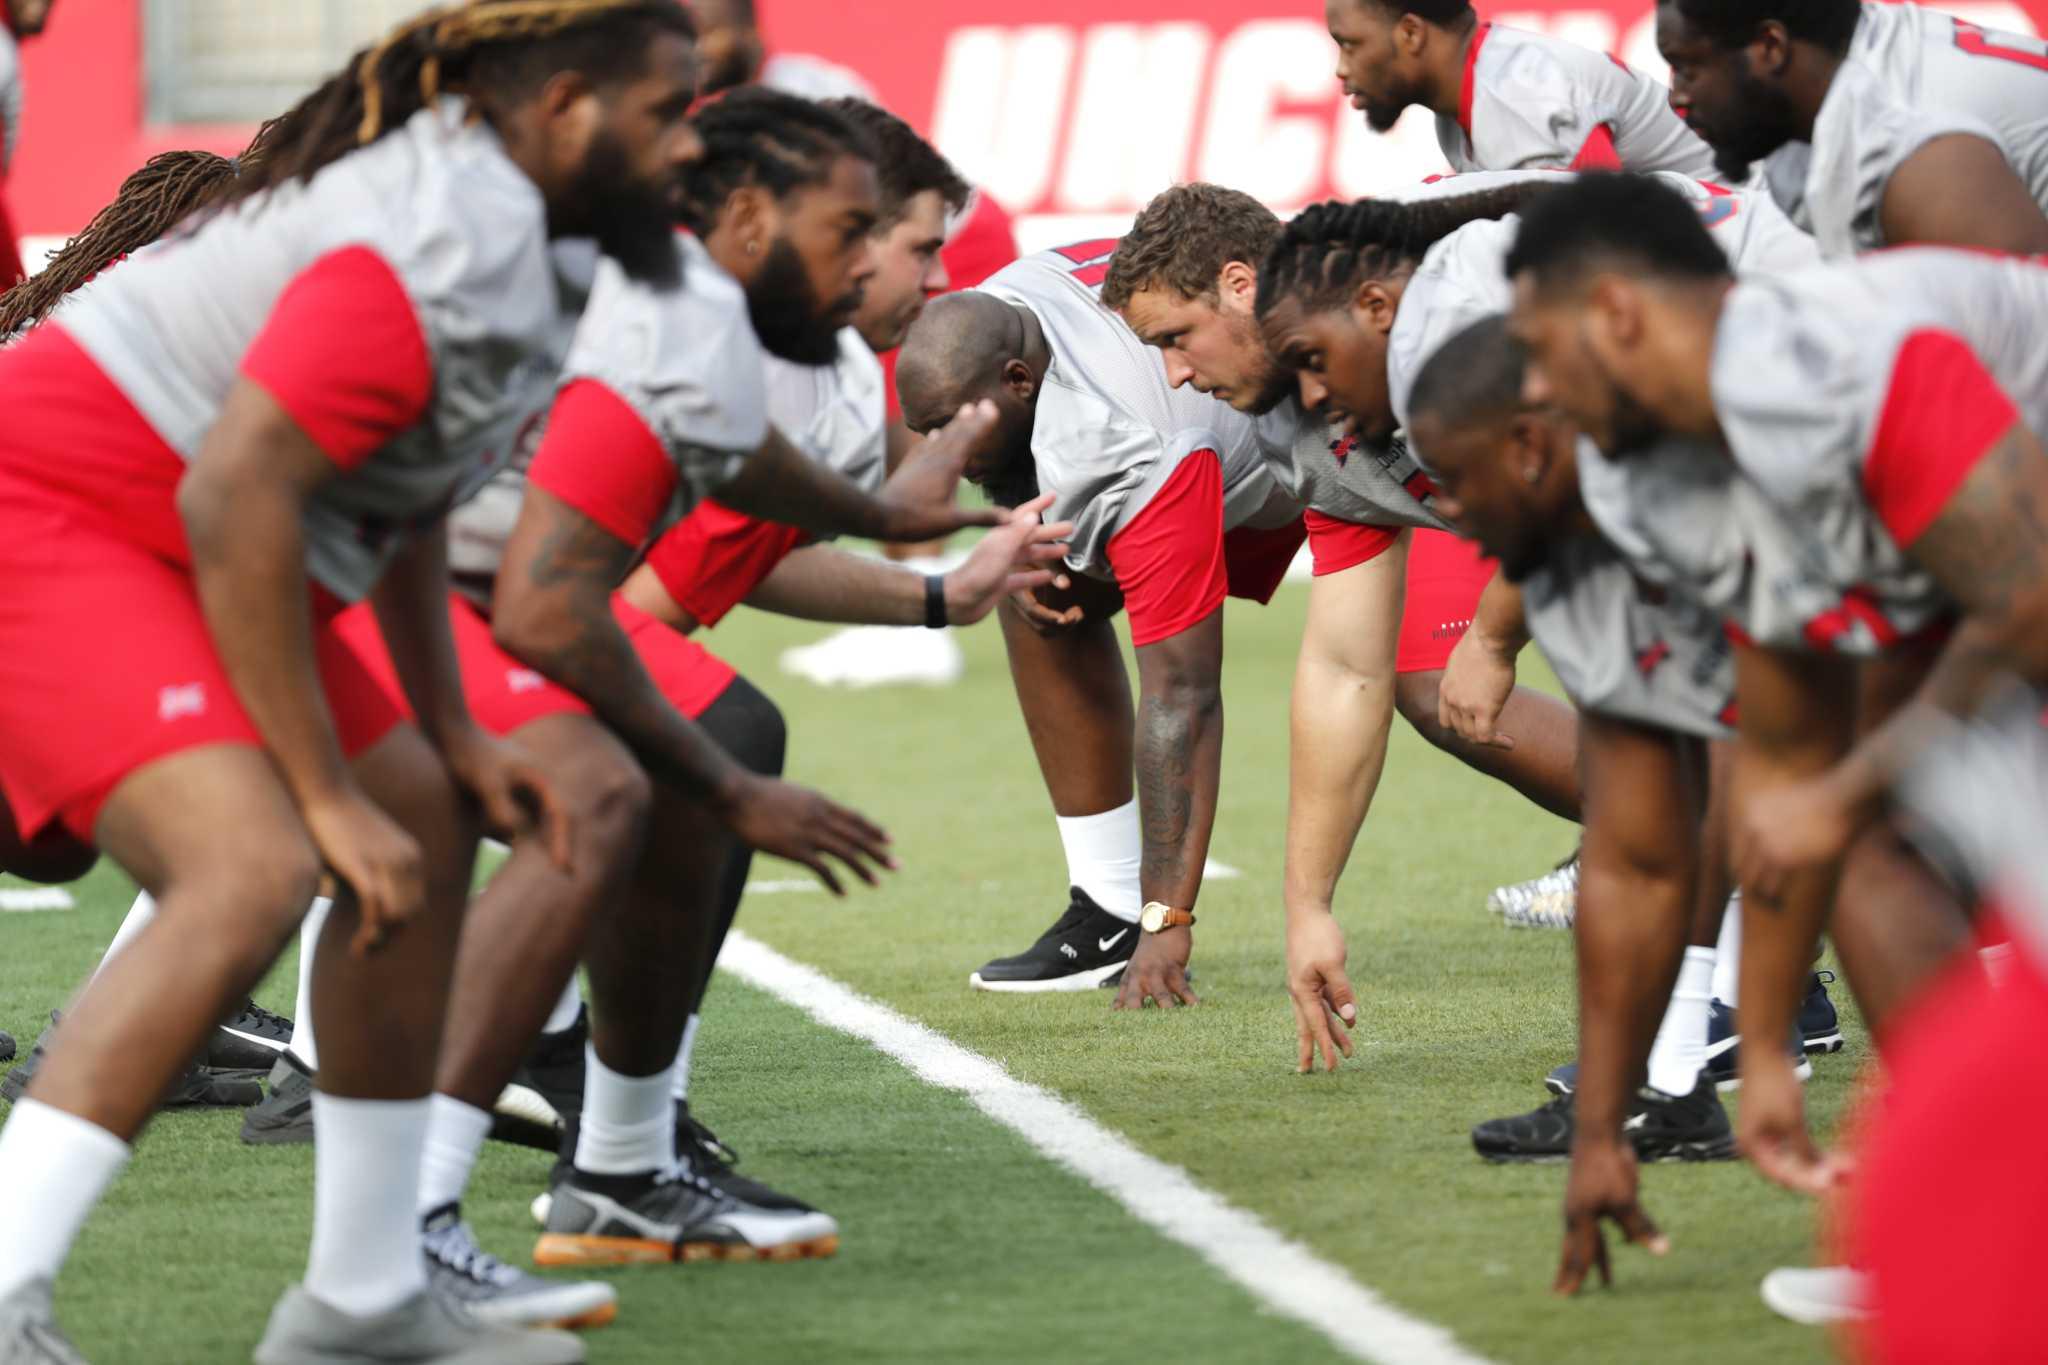 XFL's Houston Roughnecks begin practice